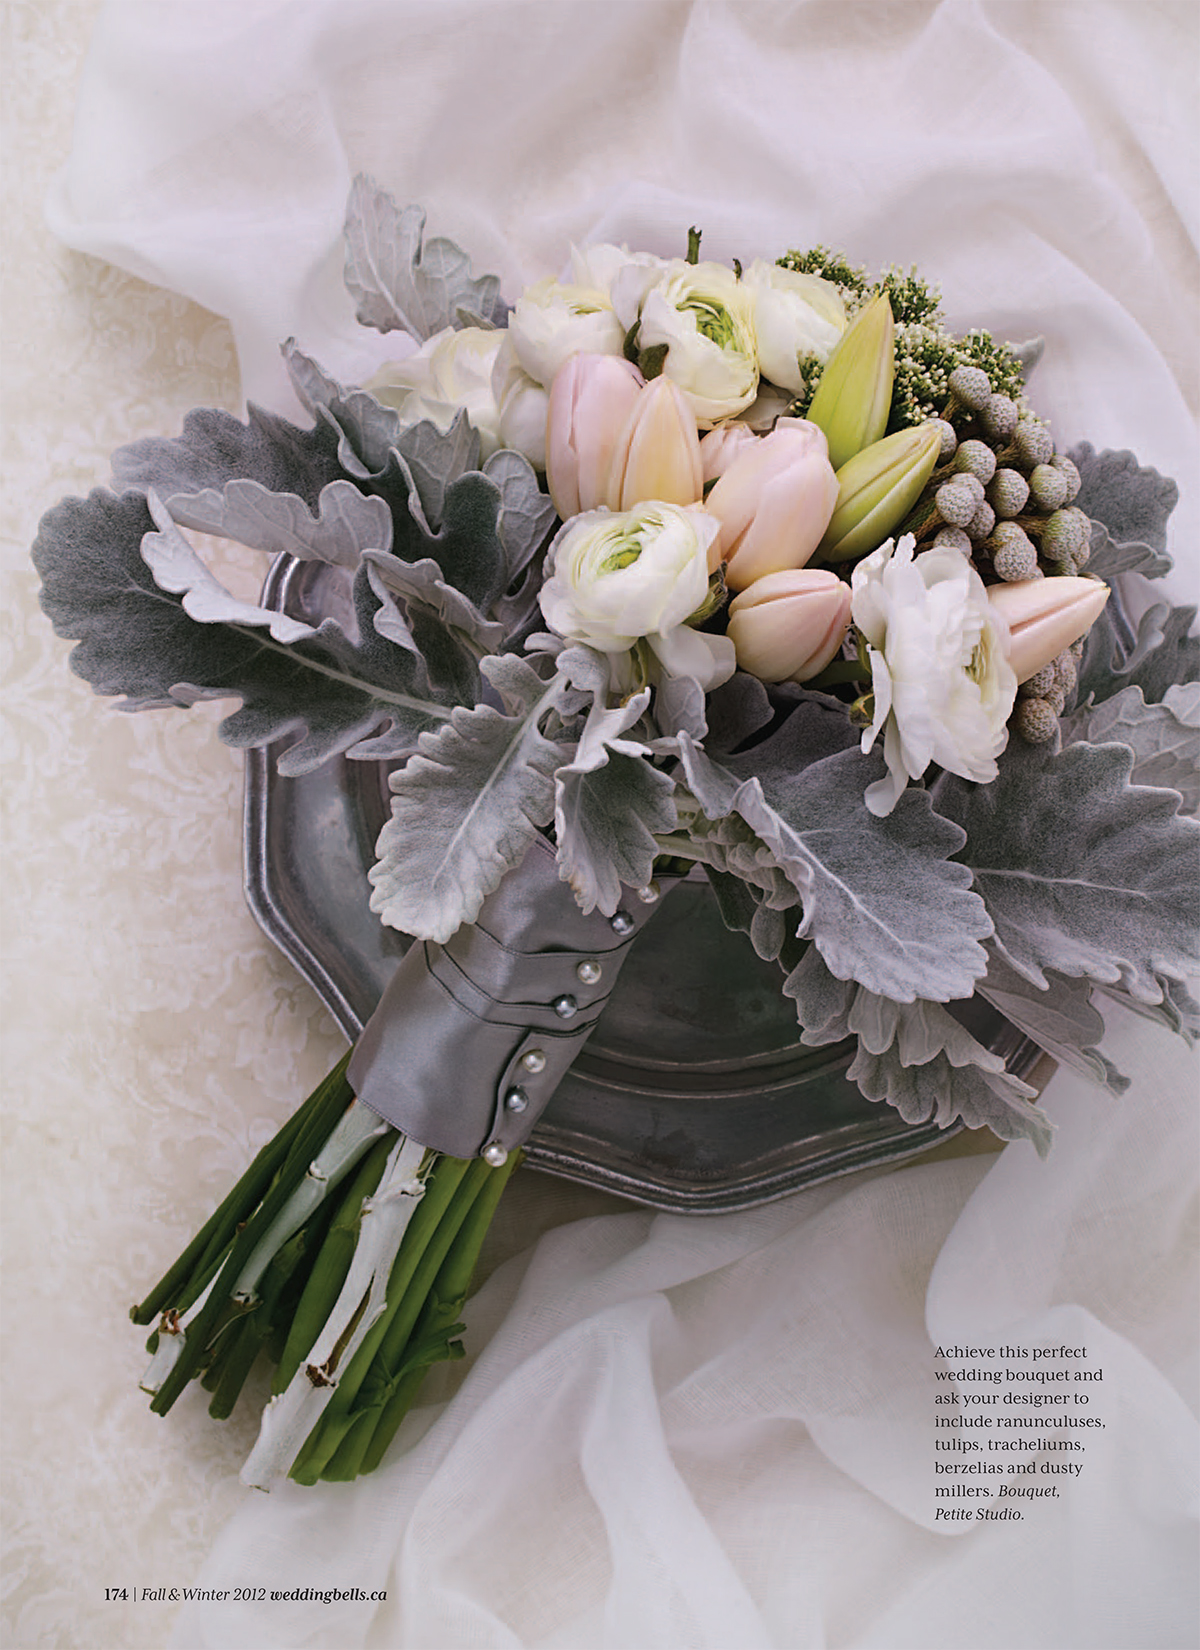 """Feel the Love.""  Weddingbells Magazine,  Fall/Winter 2012. Photo: Maya Visnyei. Styling: Catherine Doherty"